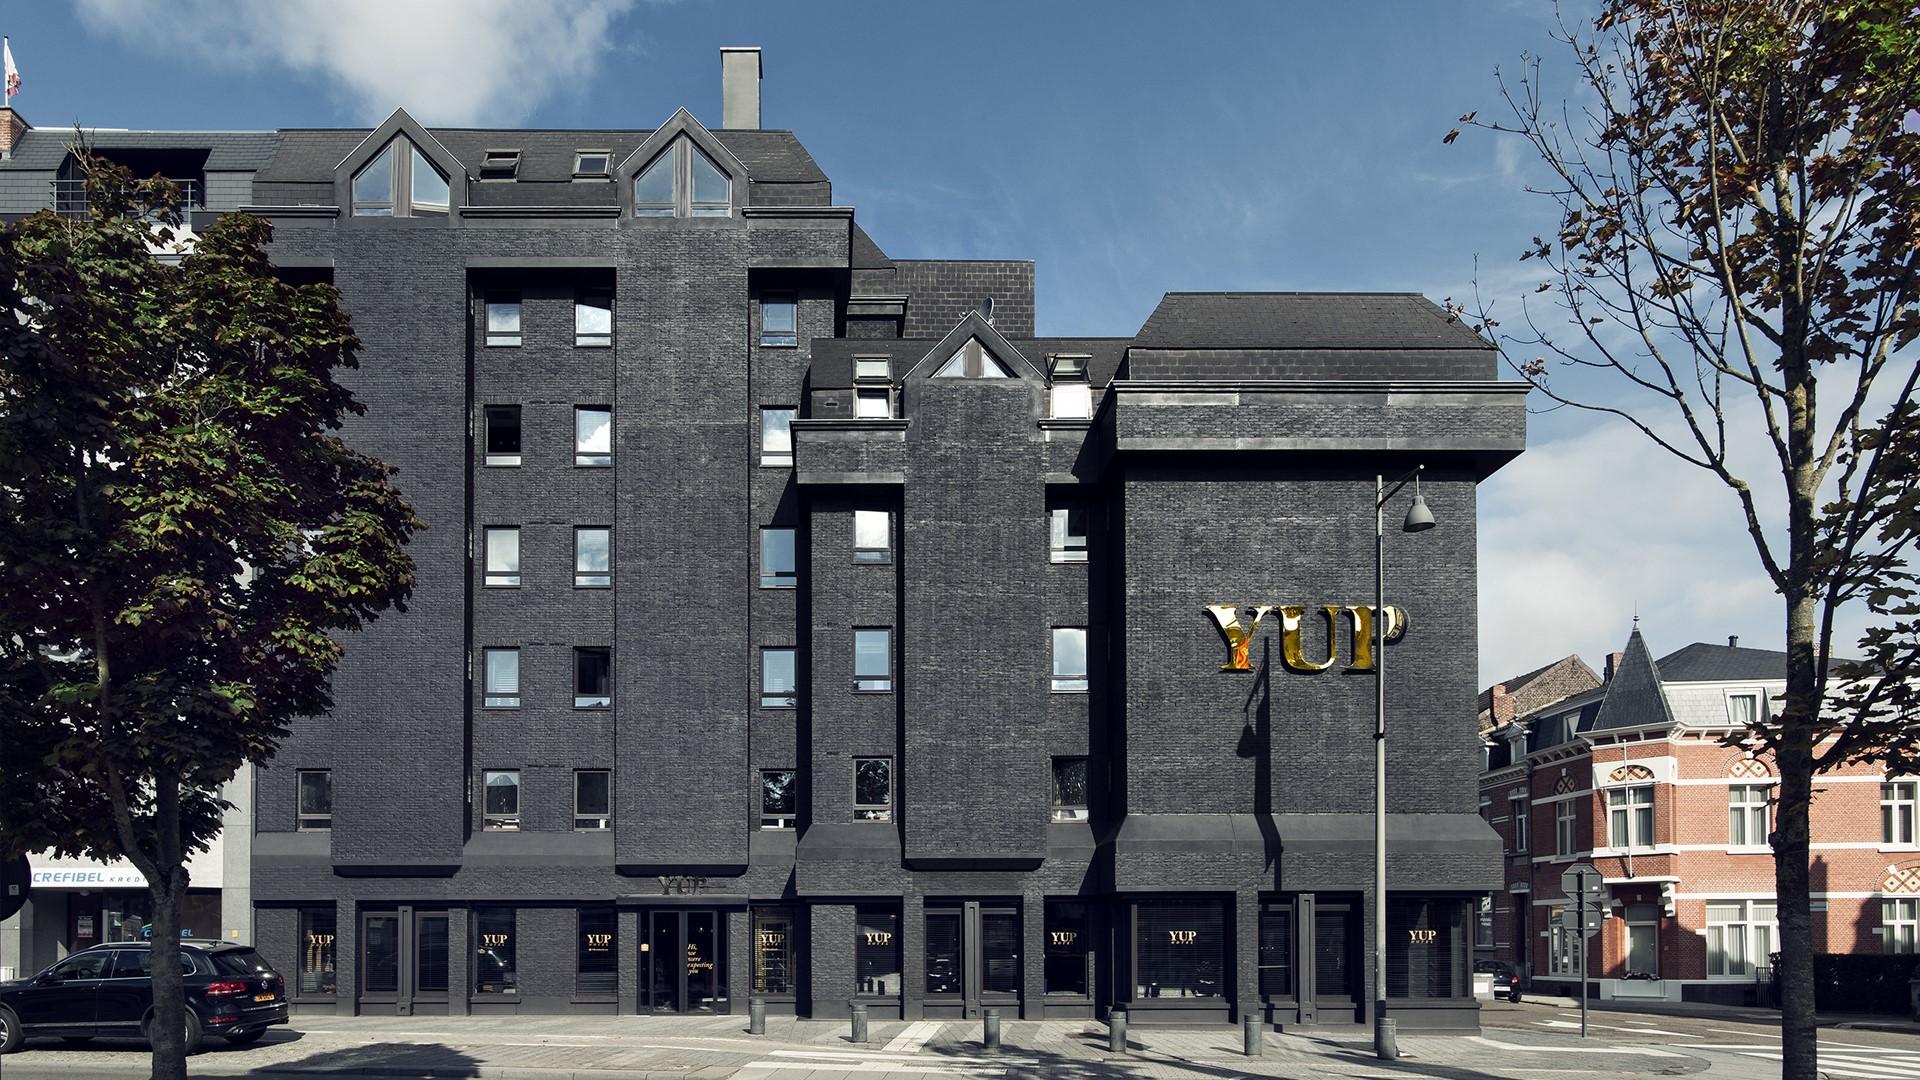 YUP Hotel - Hotspotting in Hasselt